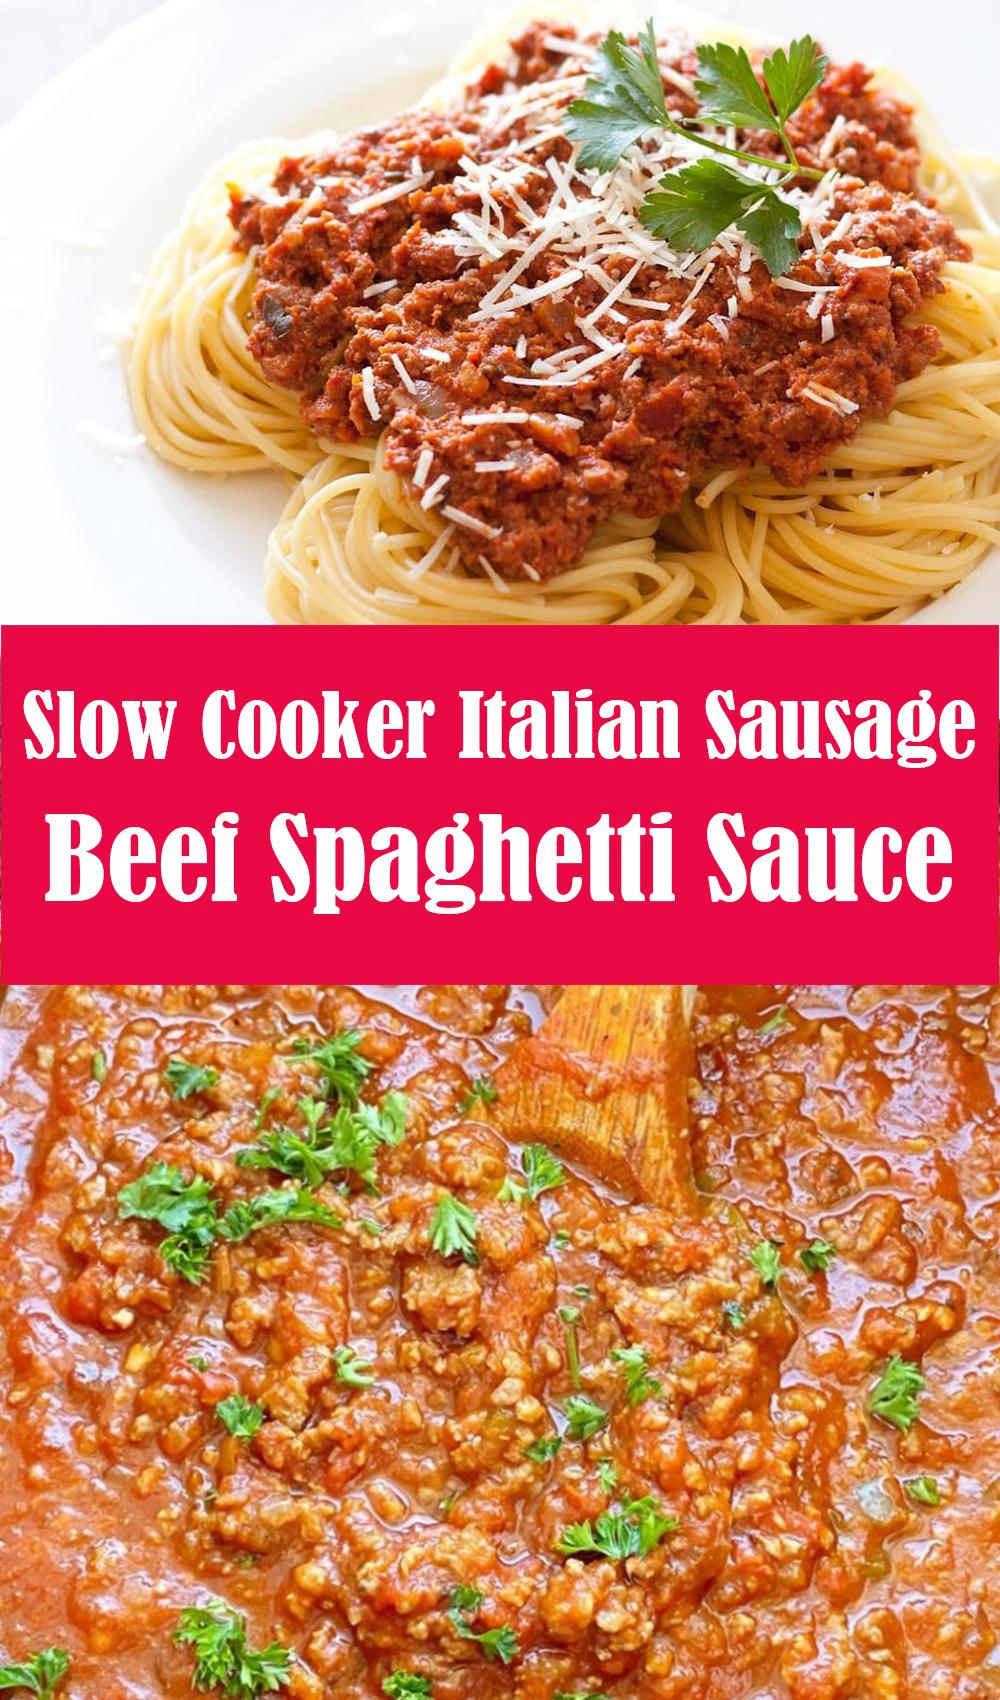 Slow Cooker Italian Sausage and Beef Spaghetti Sauce